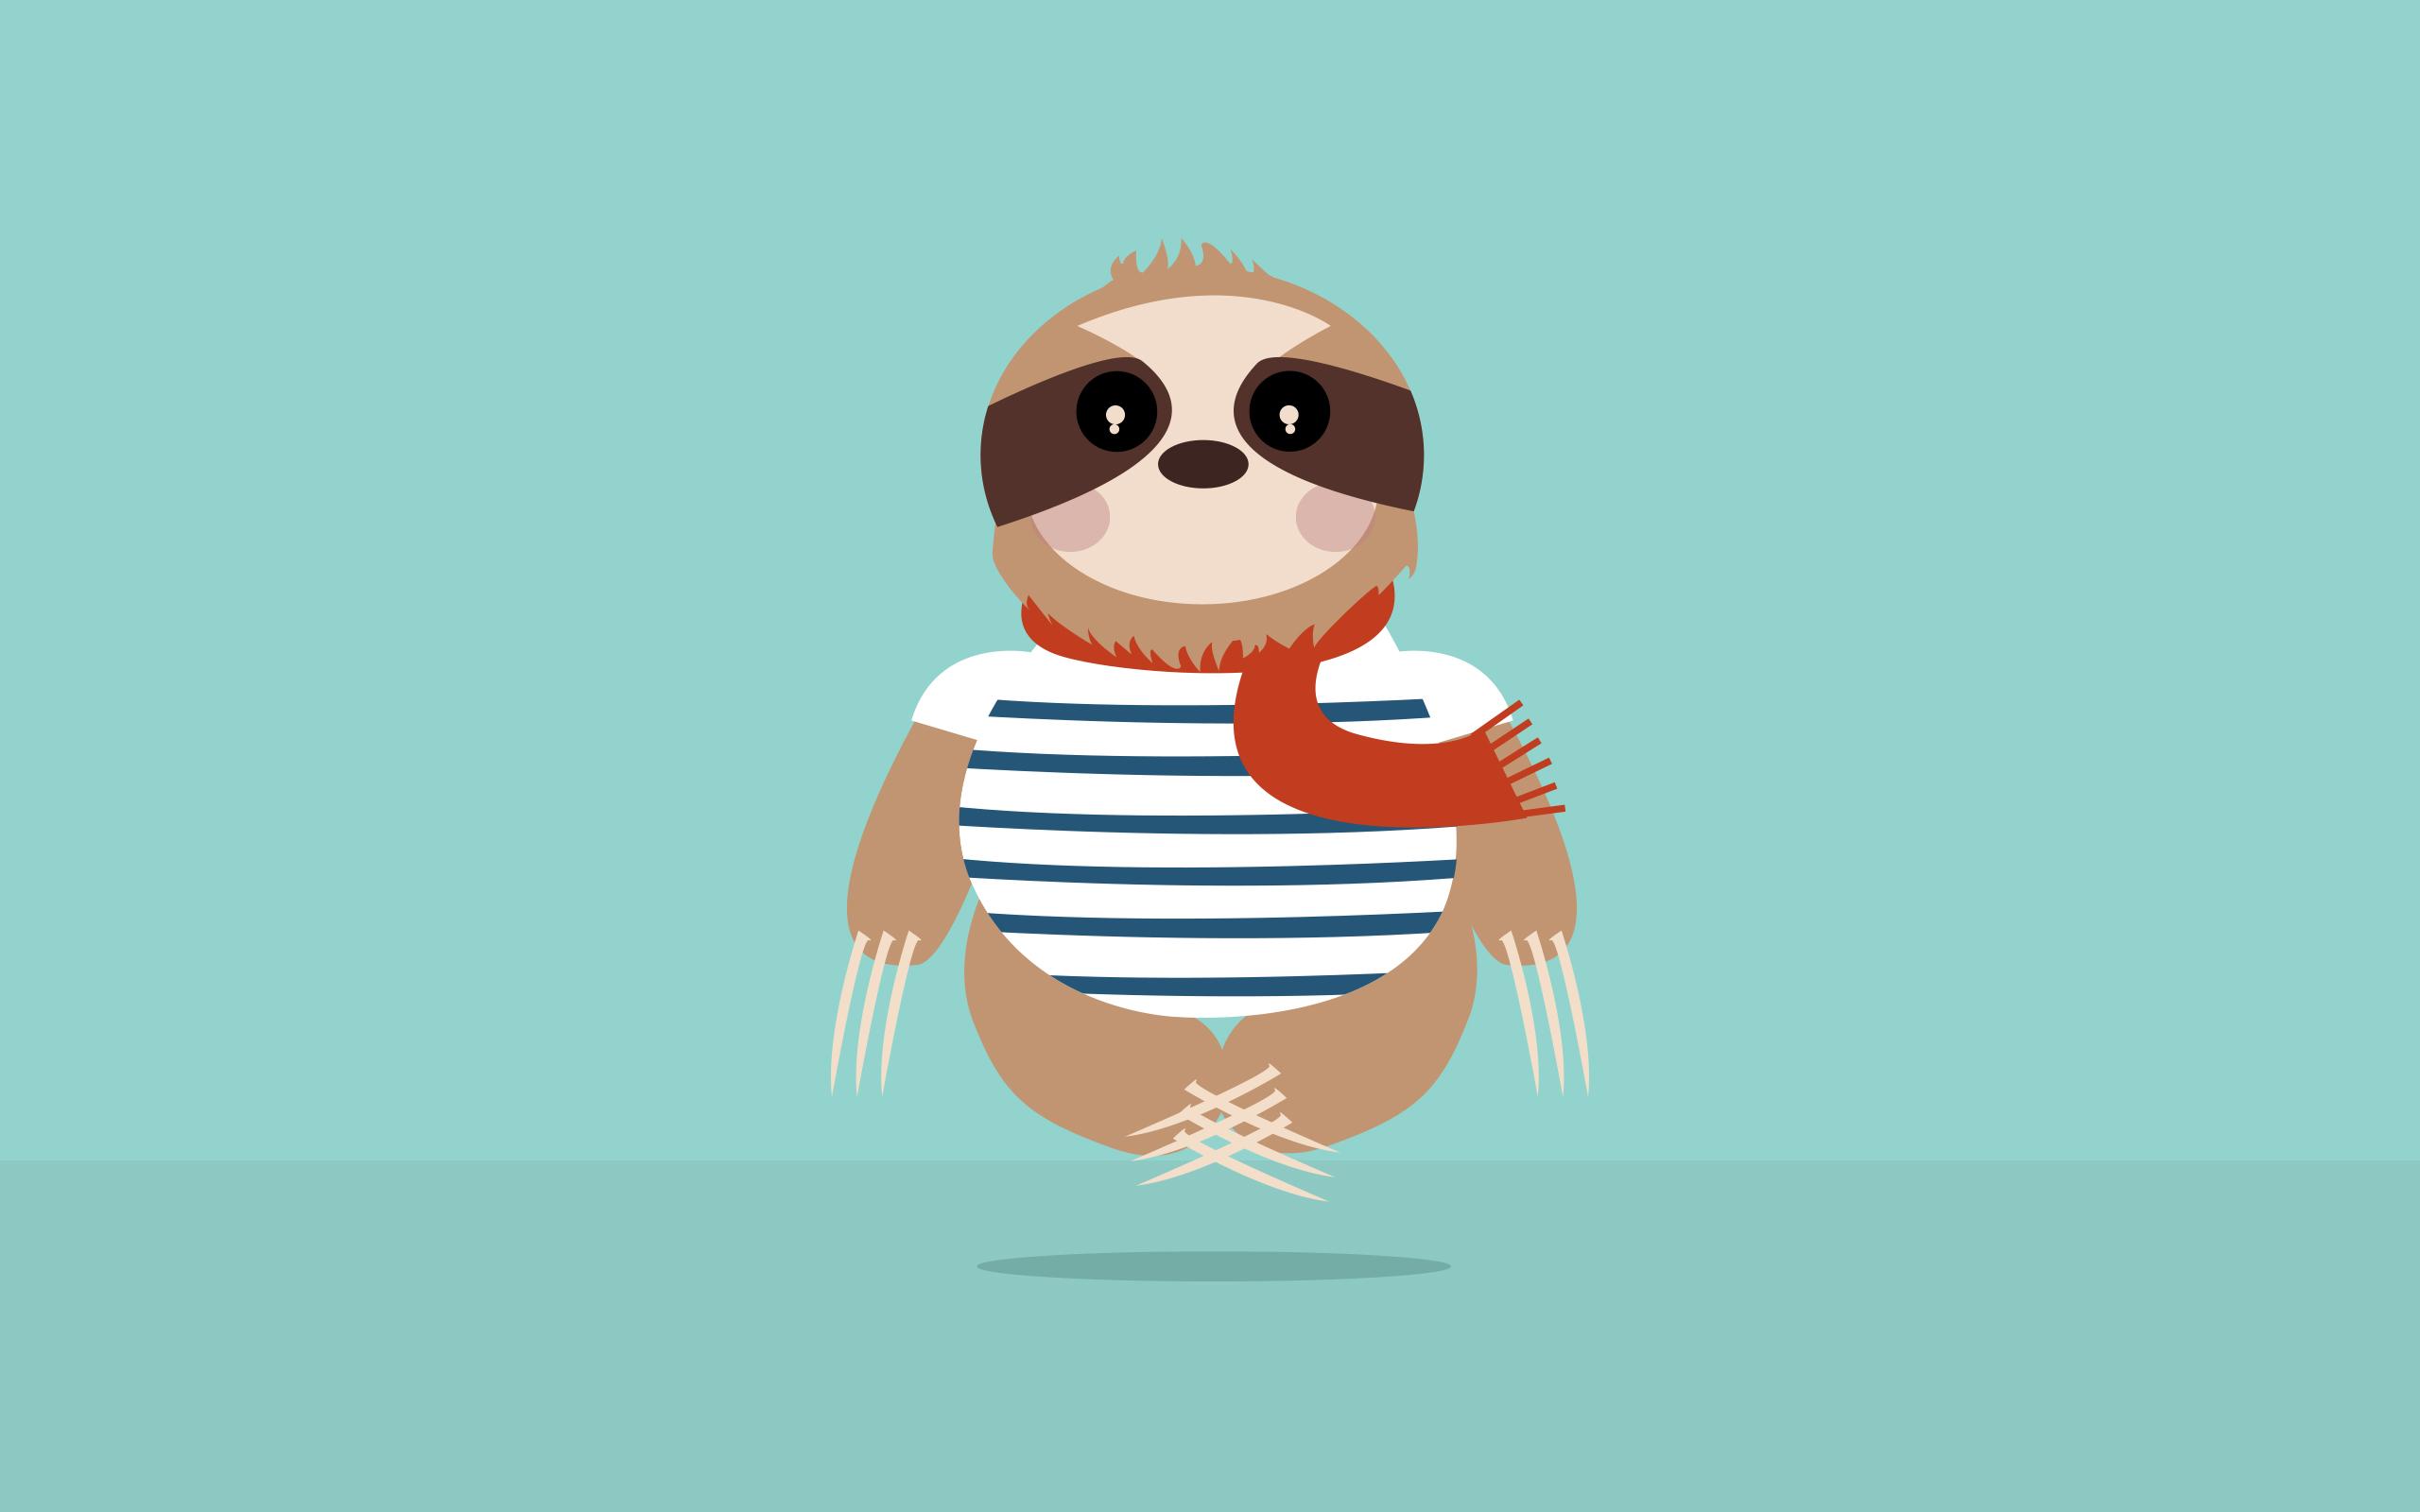 Cute Cartoon Sloth Wallpaper Sloth Backgrounds Hd Pixelstalk Net